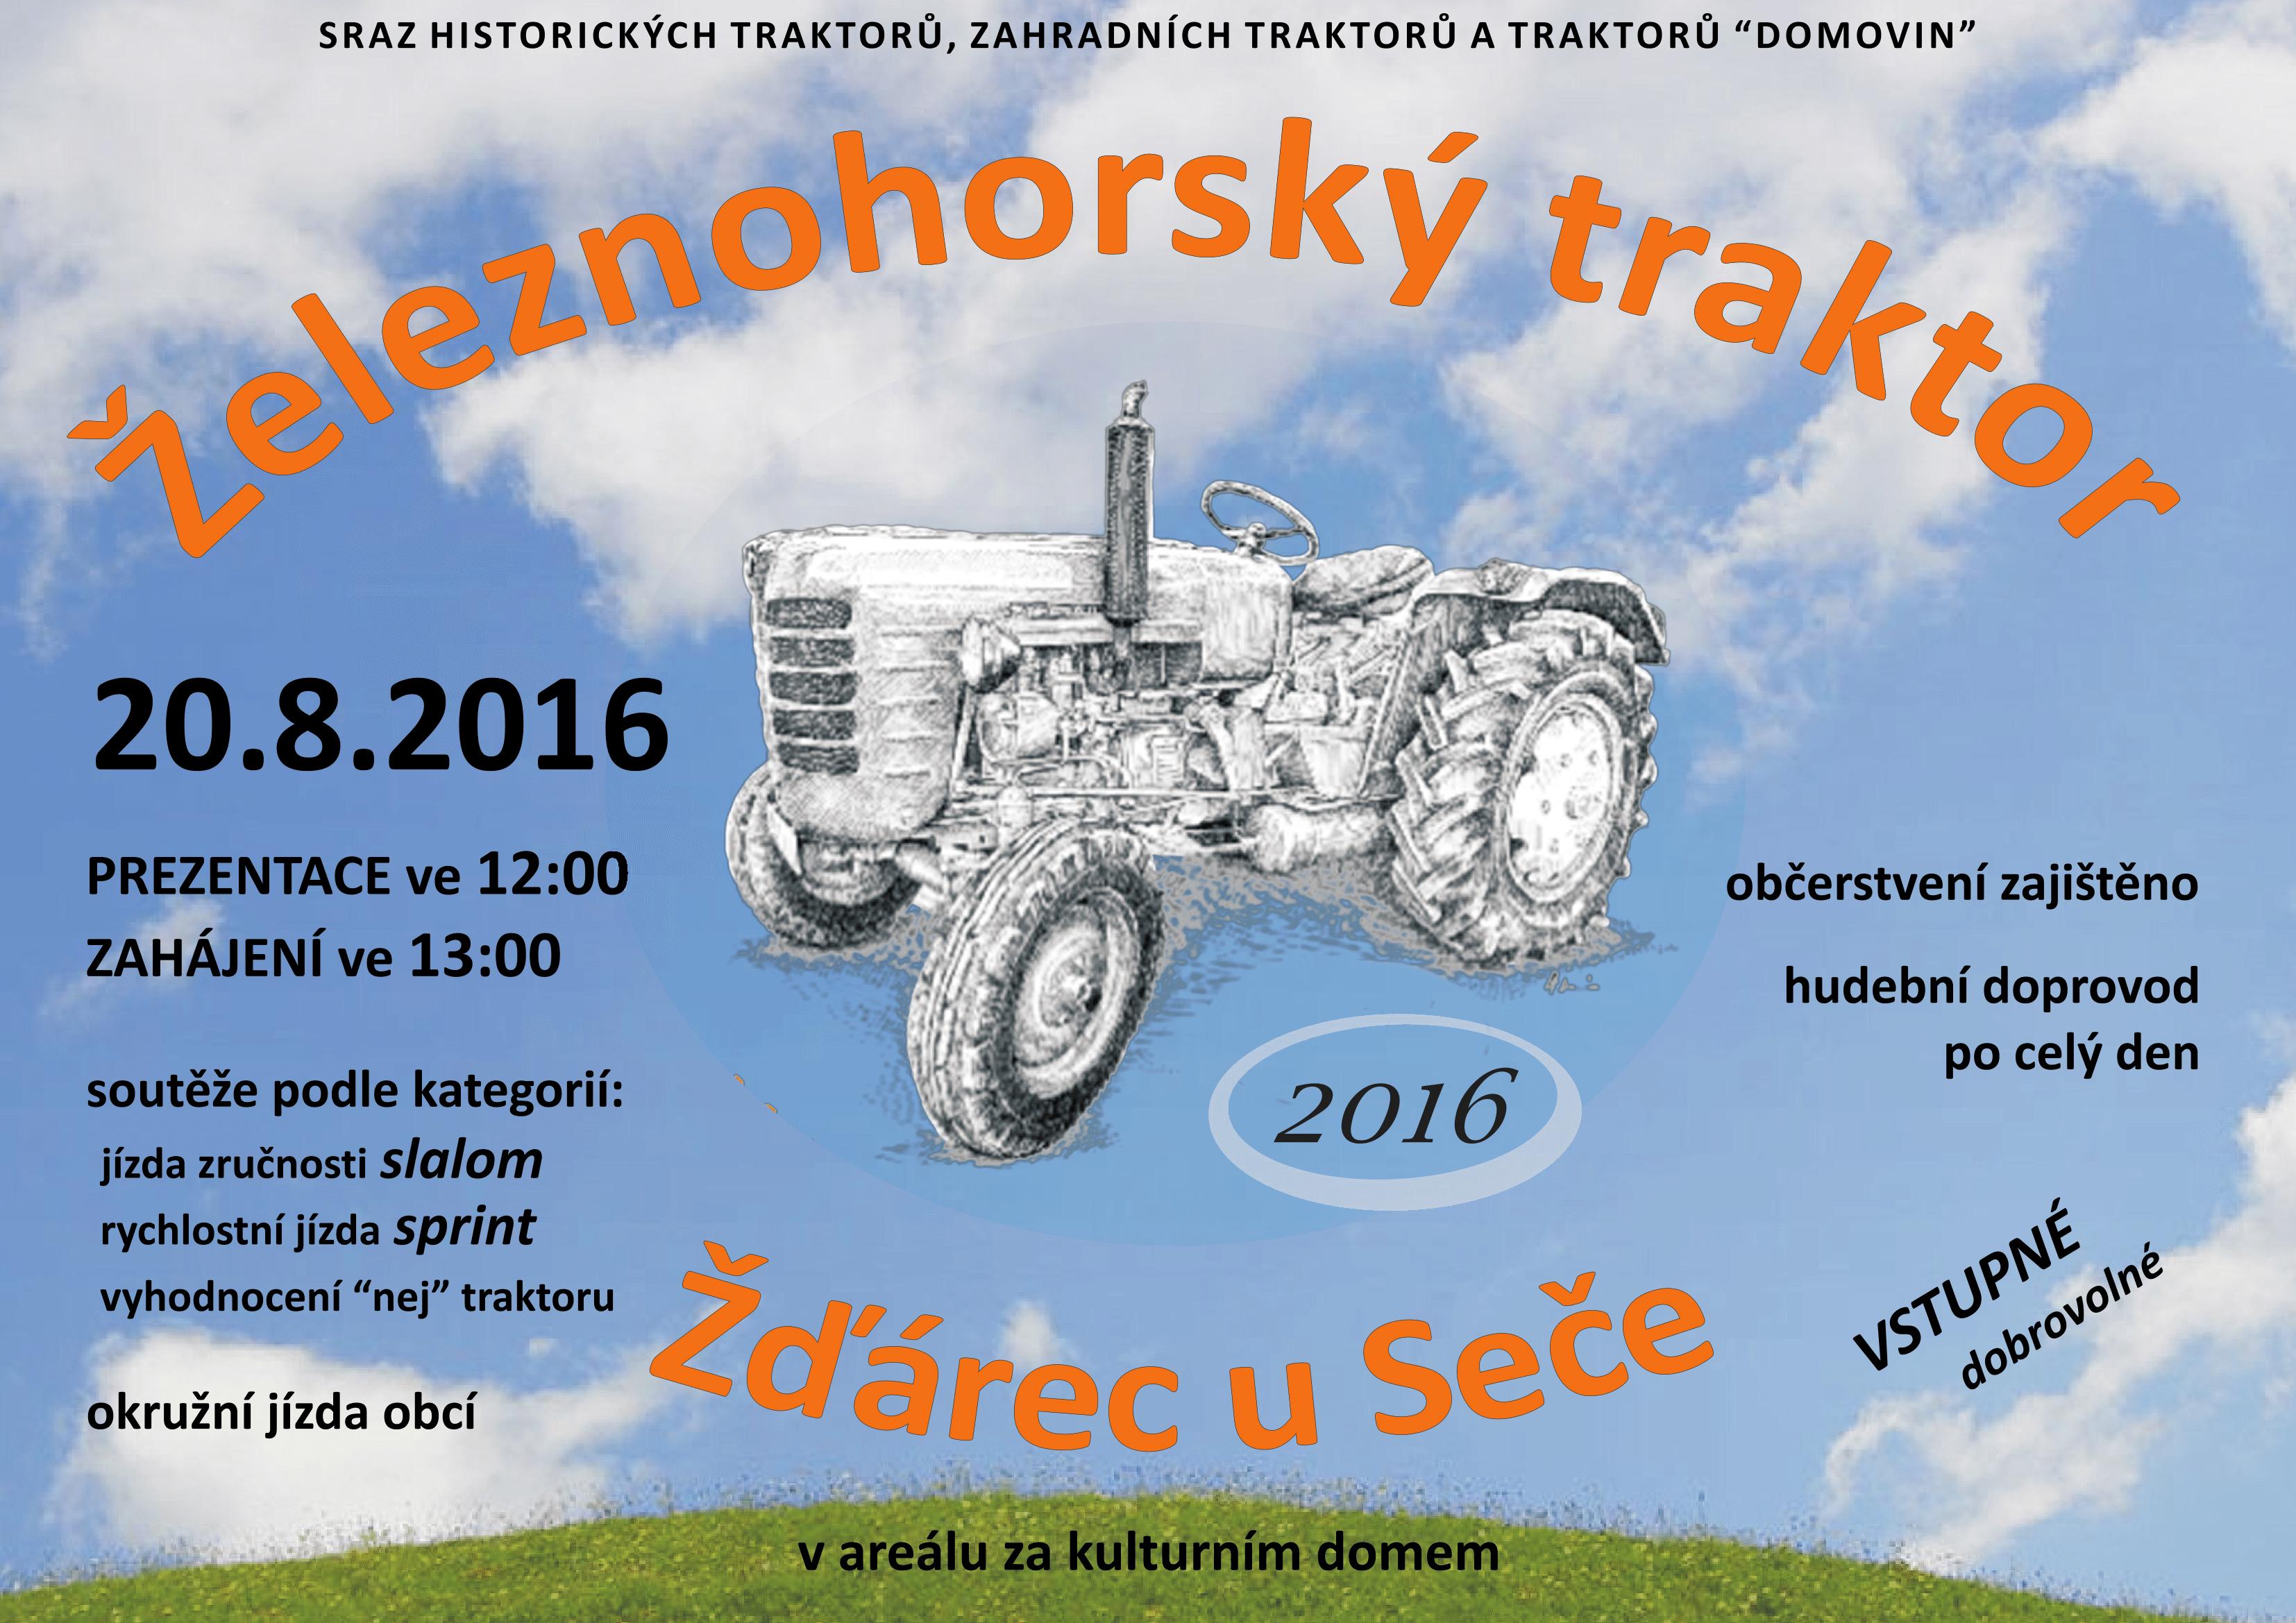 zeleznohorsky-traktor-2016